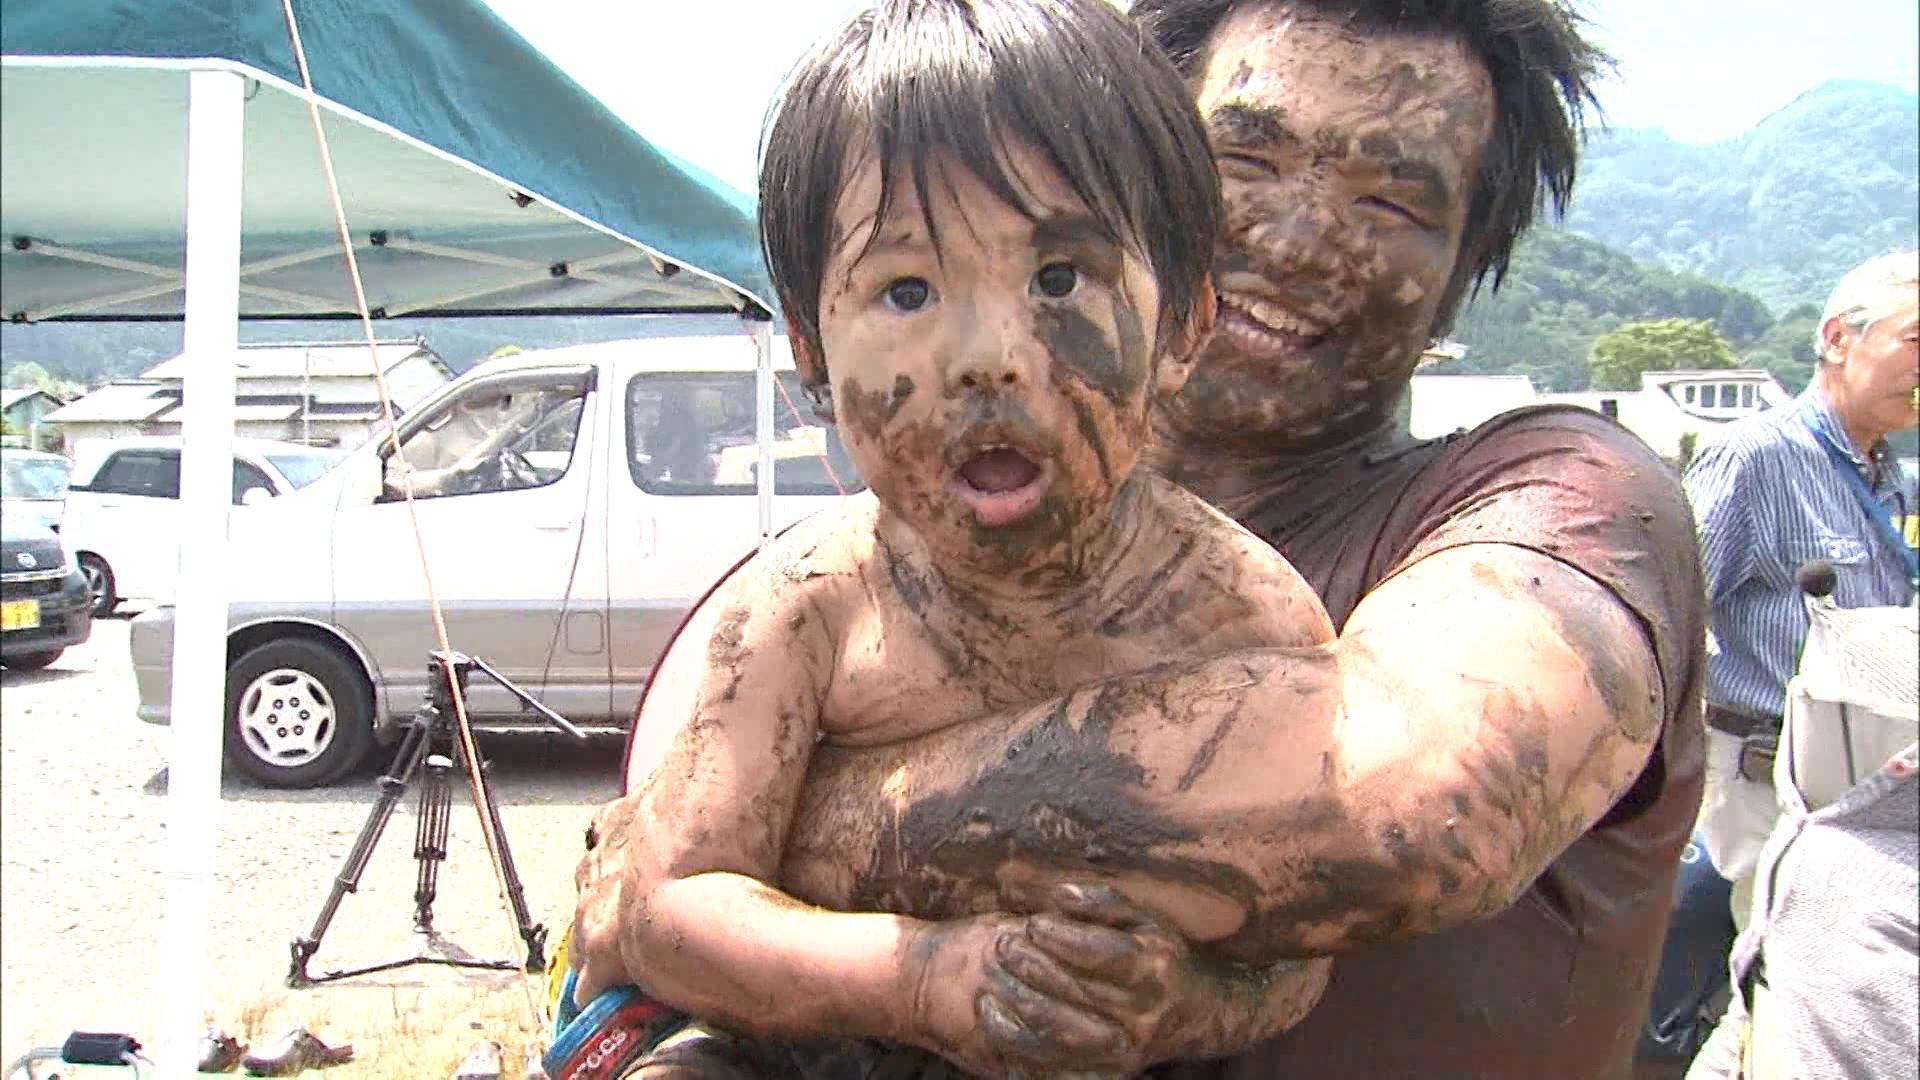 Get muddy, it's okay